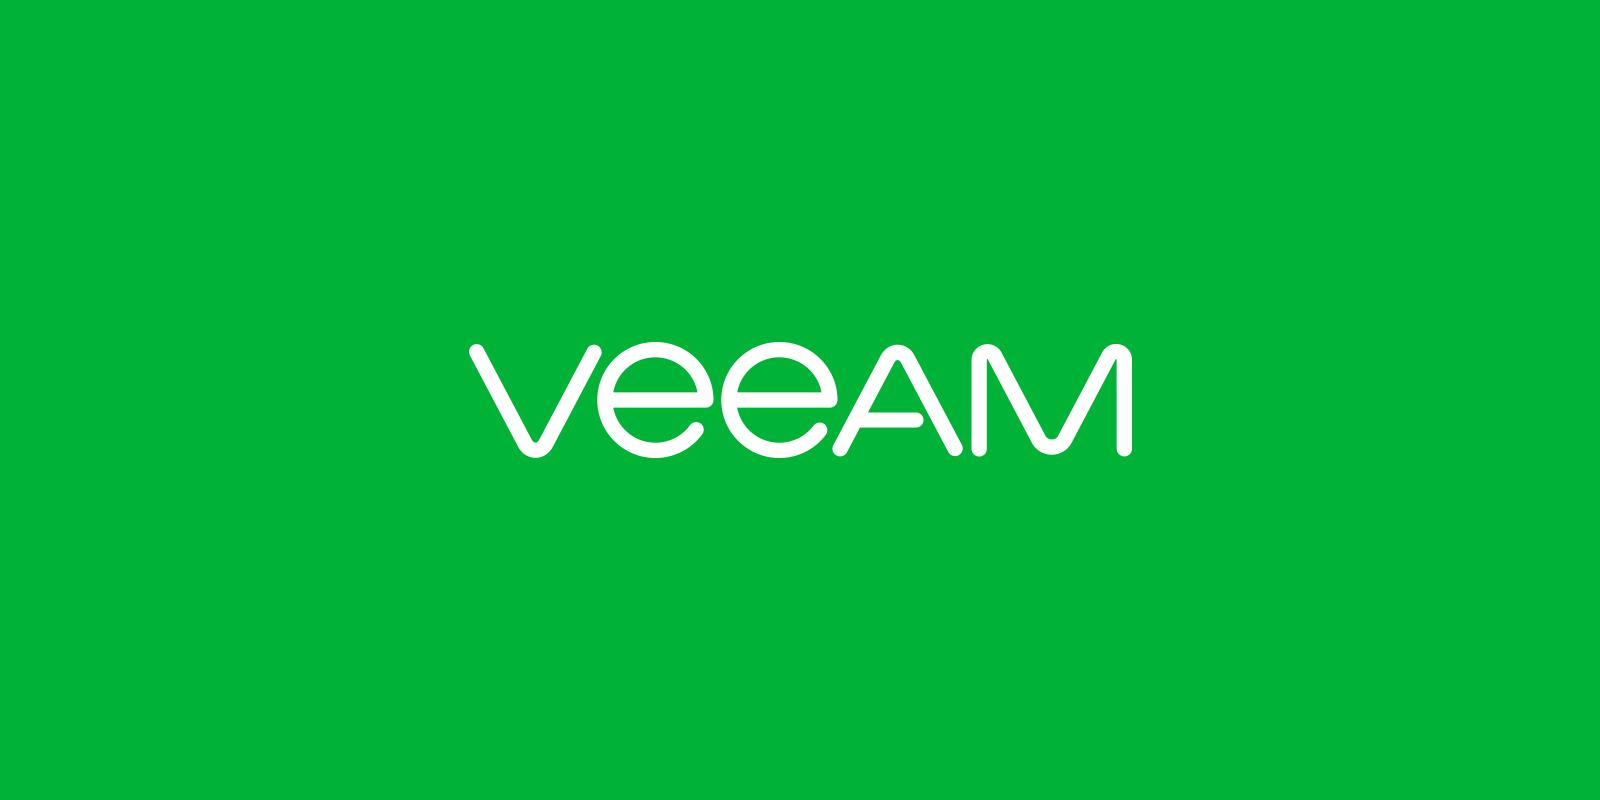 Veeam Agent Linux 3.0 installation for BTRFS